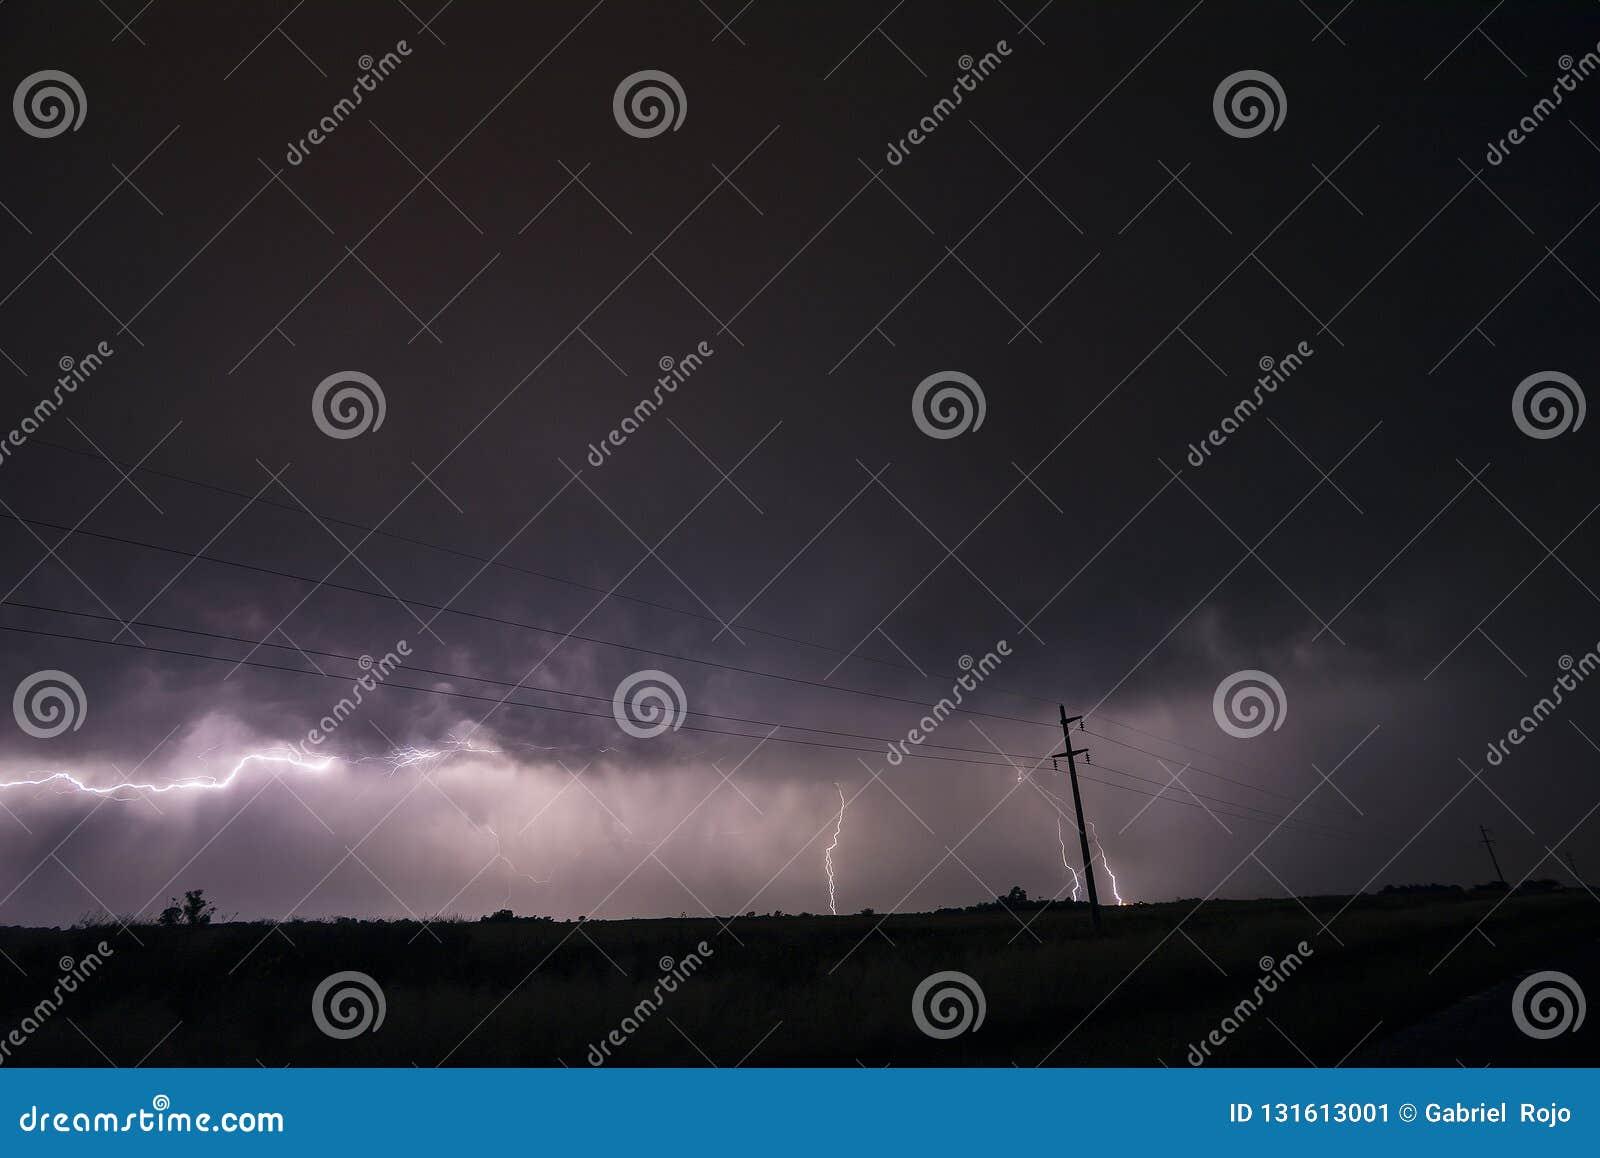 Night Pampas landscape, Argentina